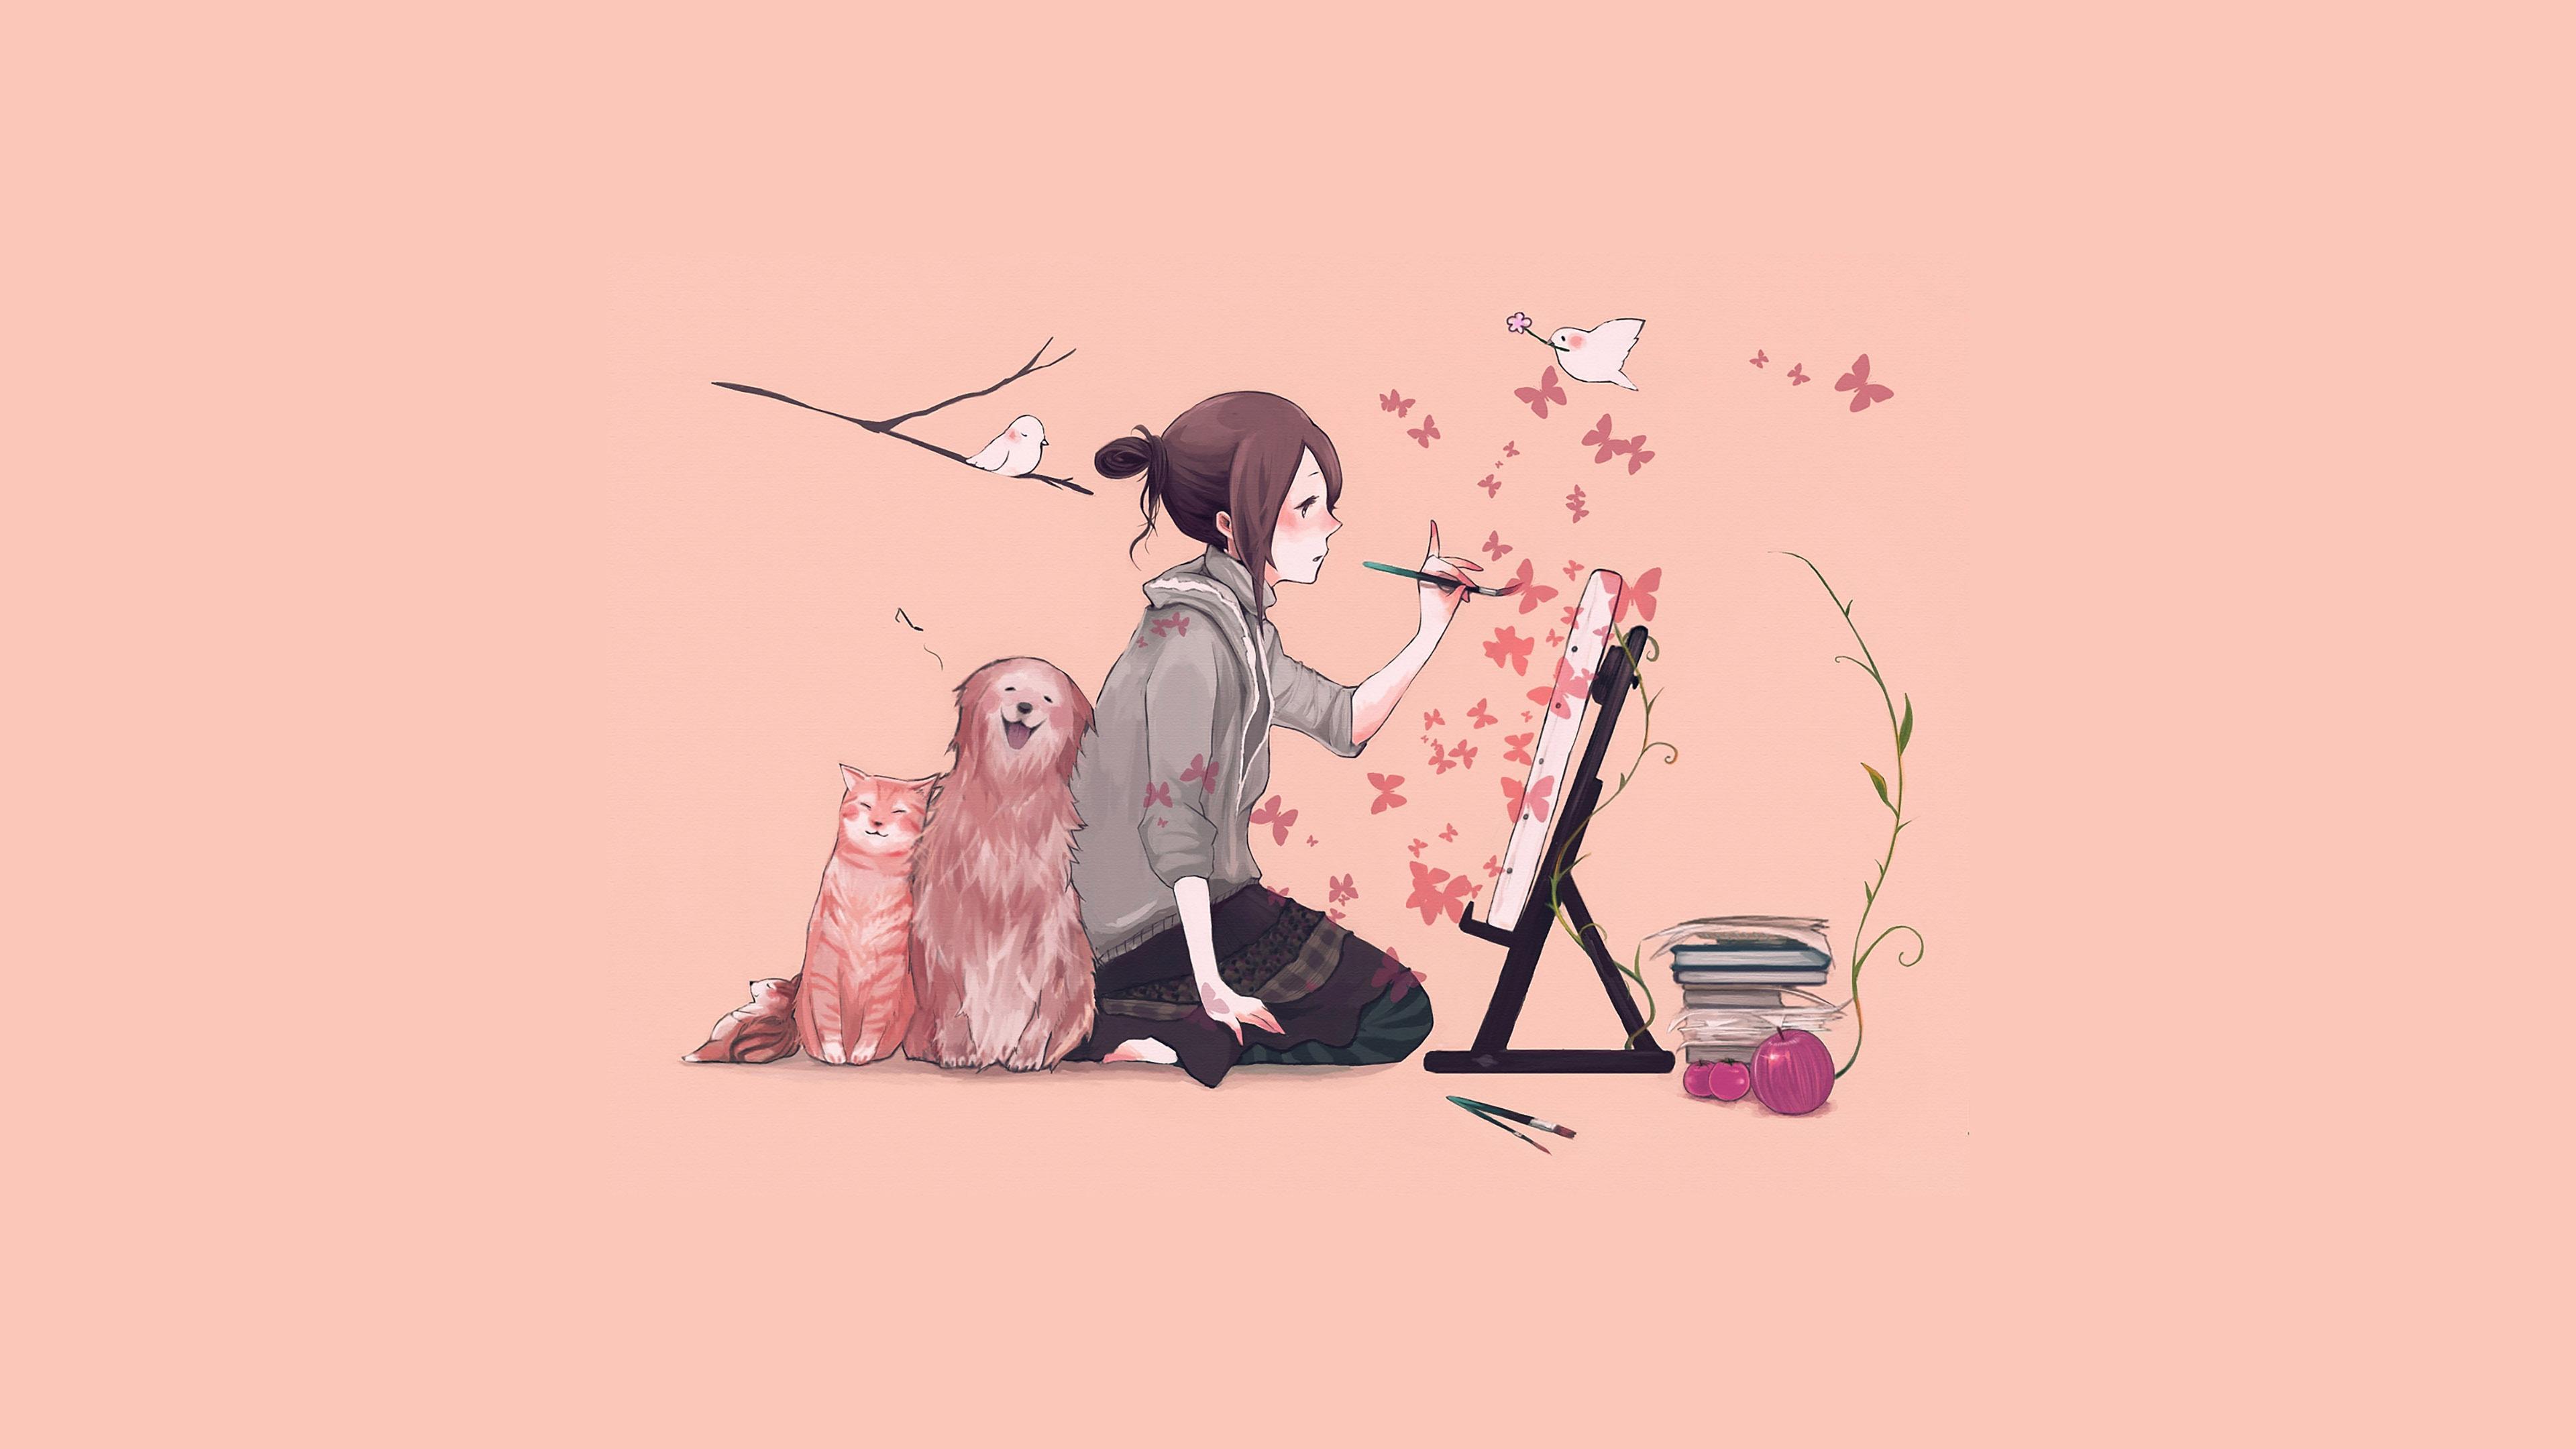 Wallpaper For Desktop Laptop Aj49 Illustrator Dog Cat Pink Art Illust